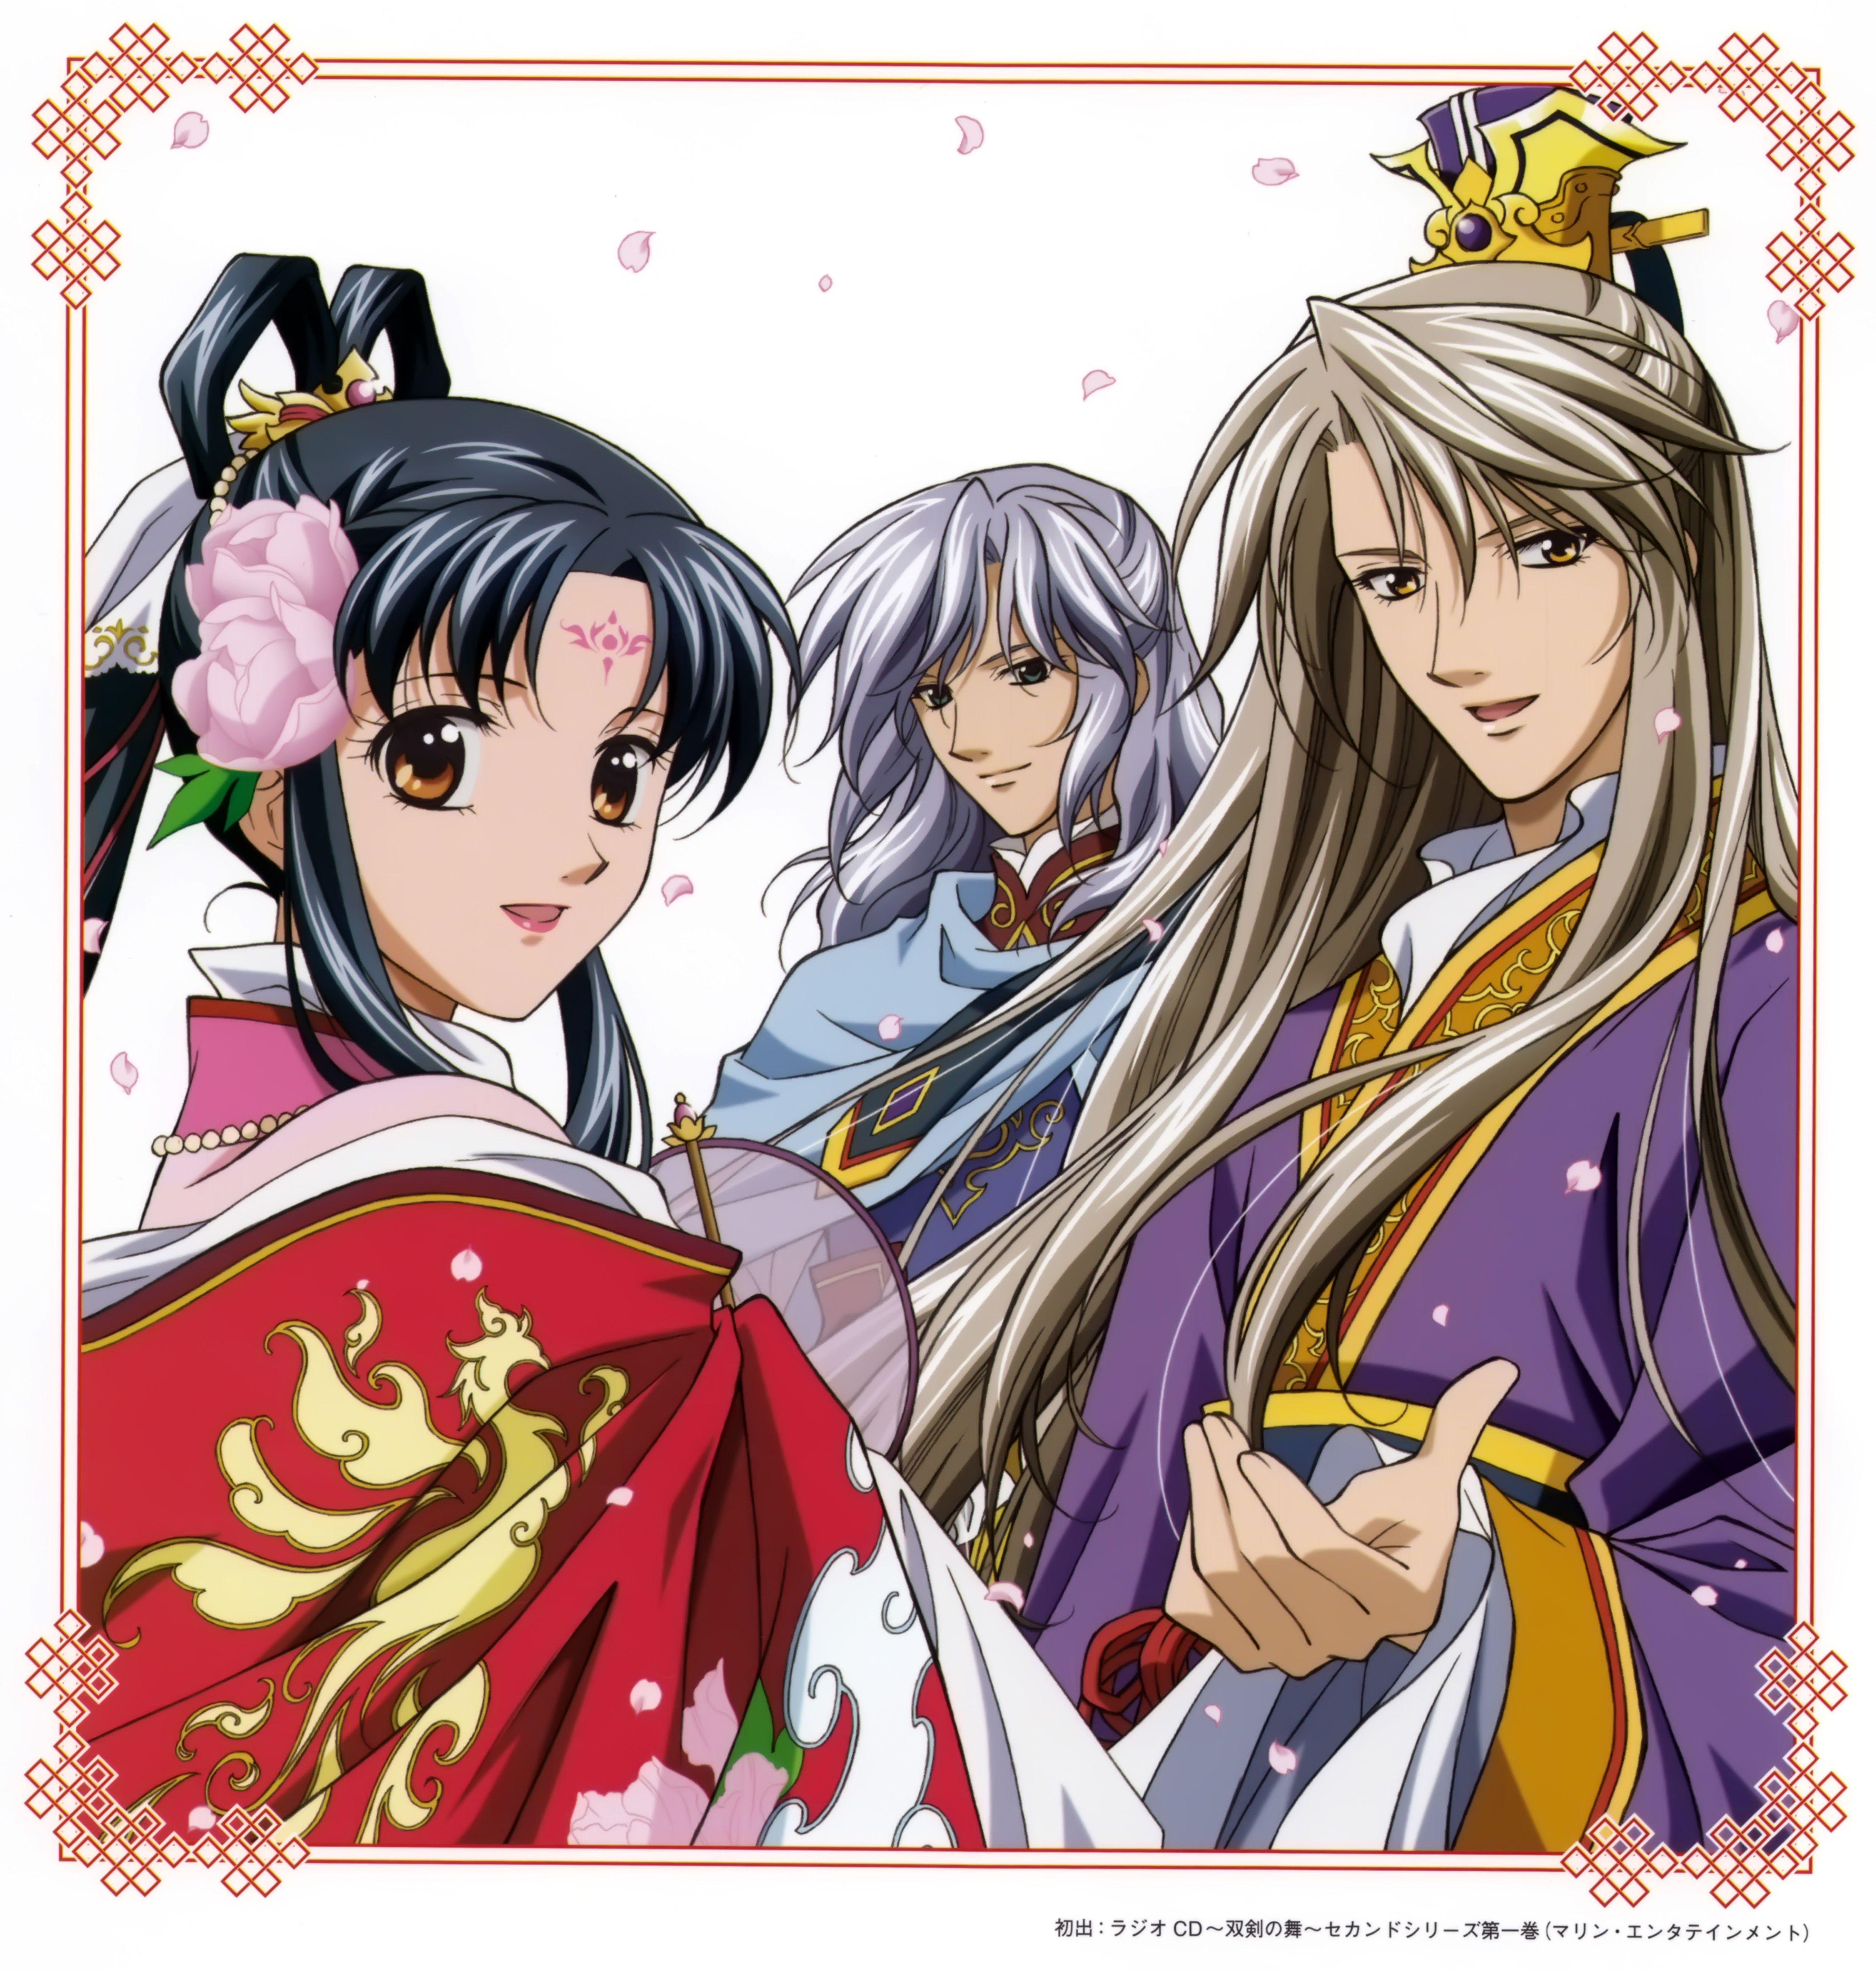 Shuurei, Seiran and Ryuuki Anime, Anime english dubbed